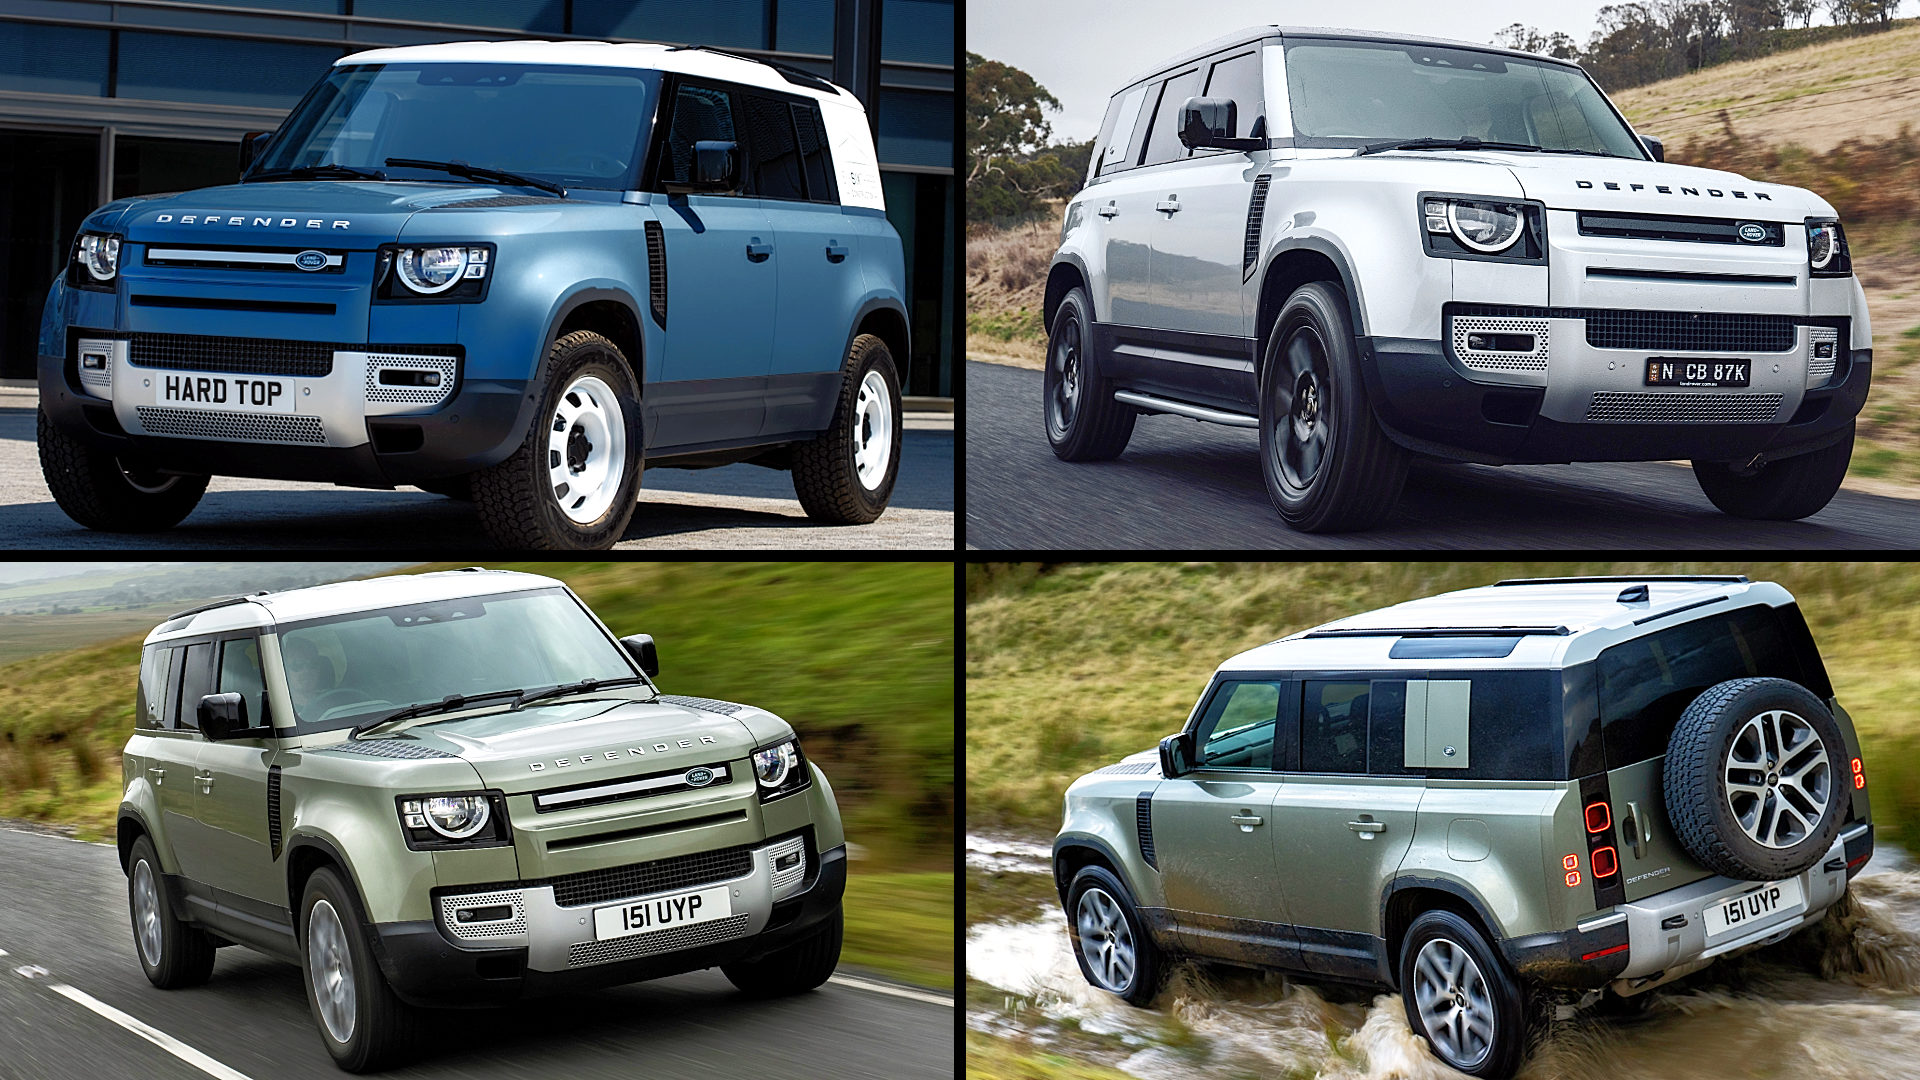 2021 Land Rover Defender USA 4 Door Images